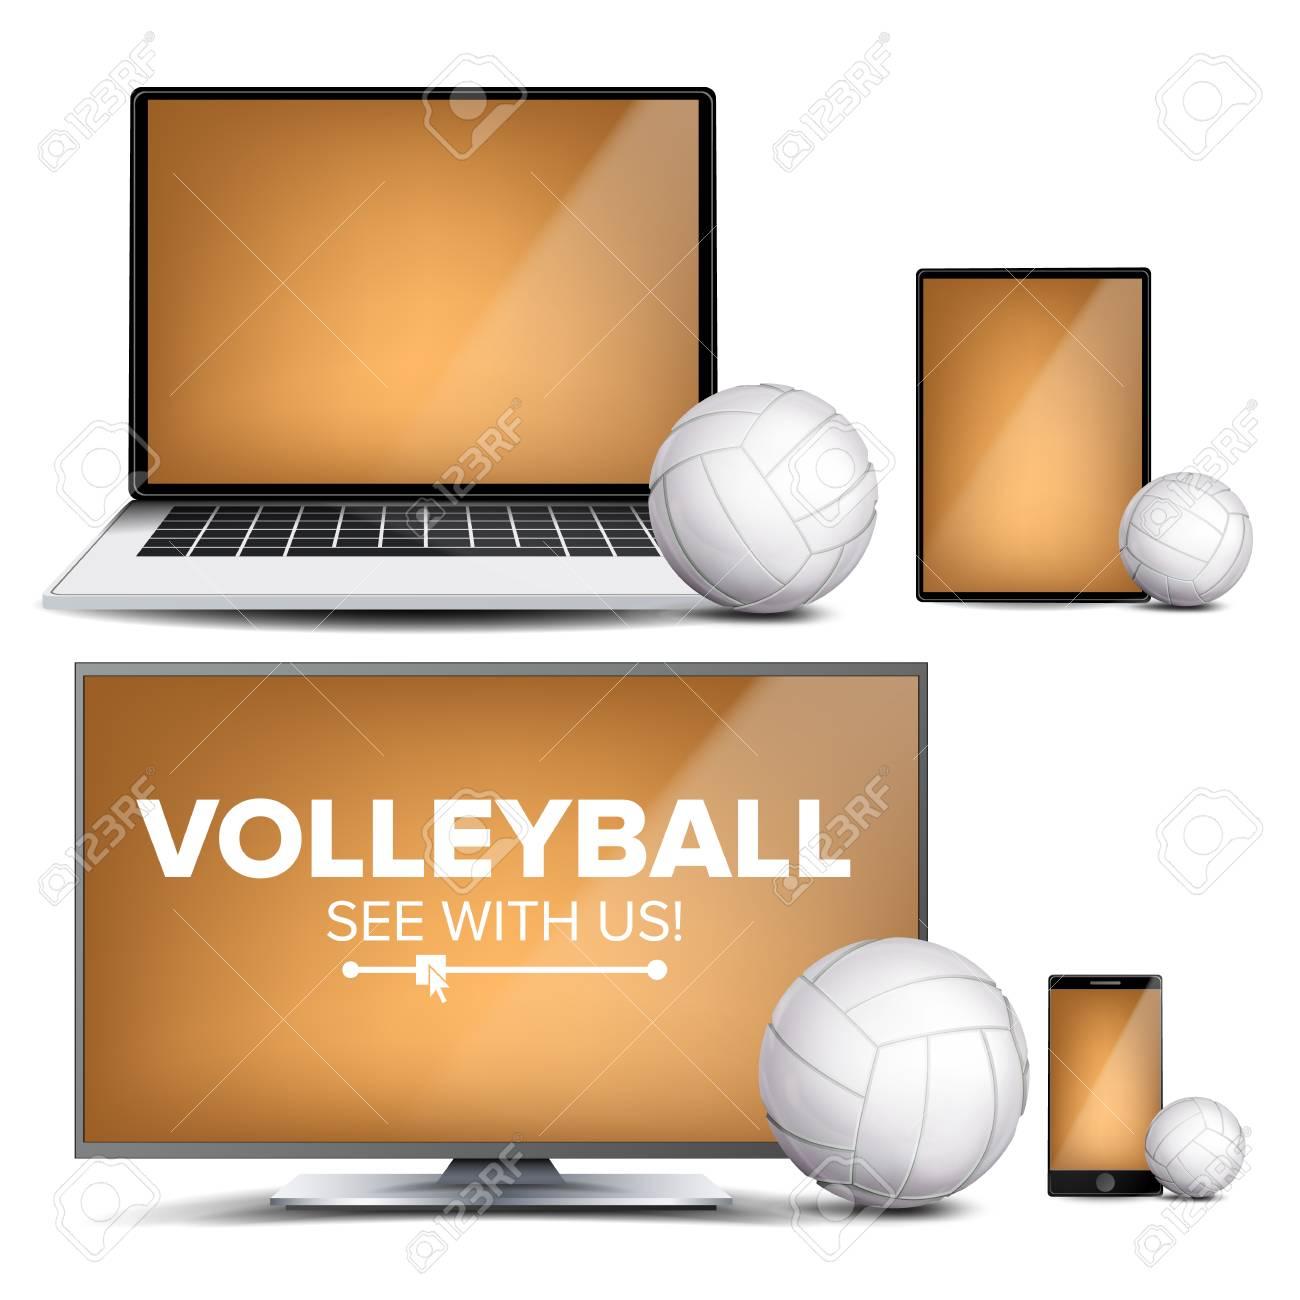 Volleyball Application Vector  Field, Volleyball Ball  Online